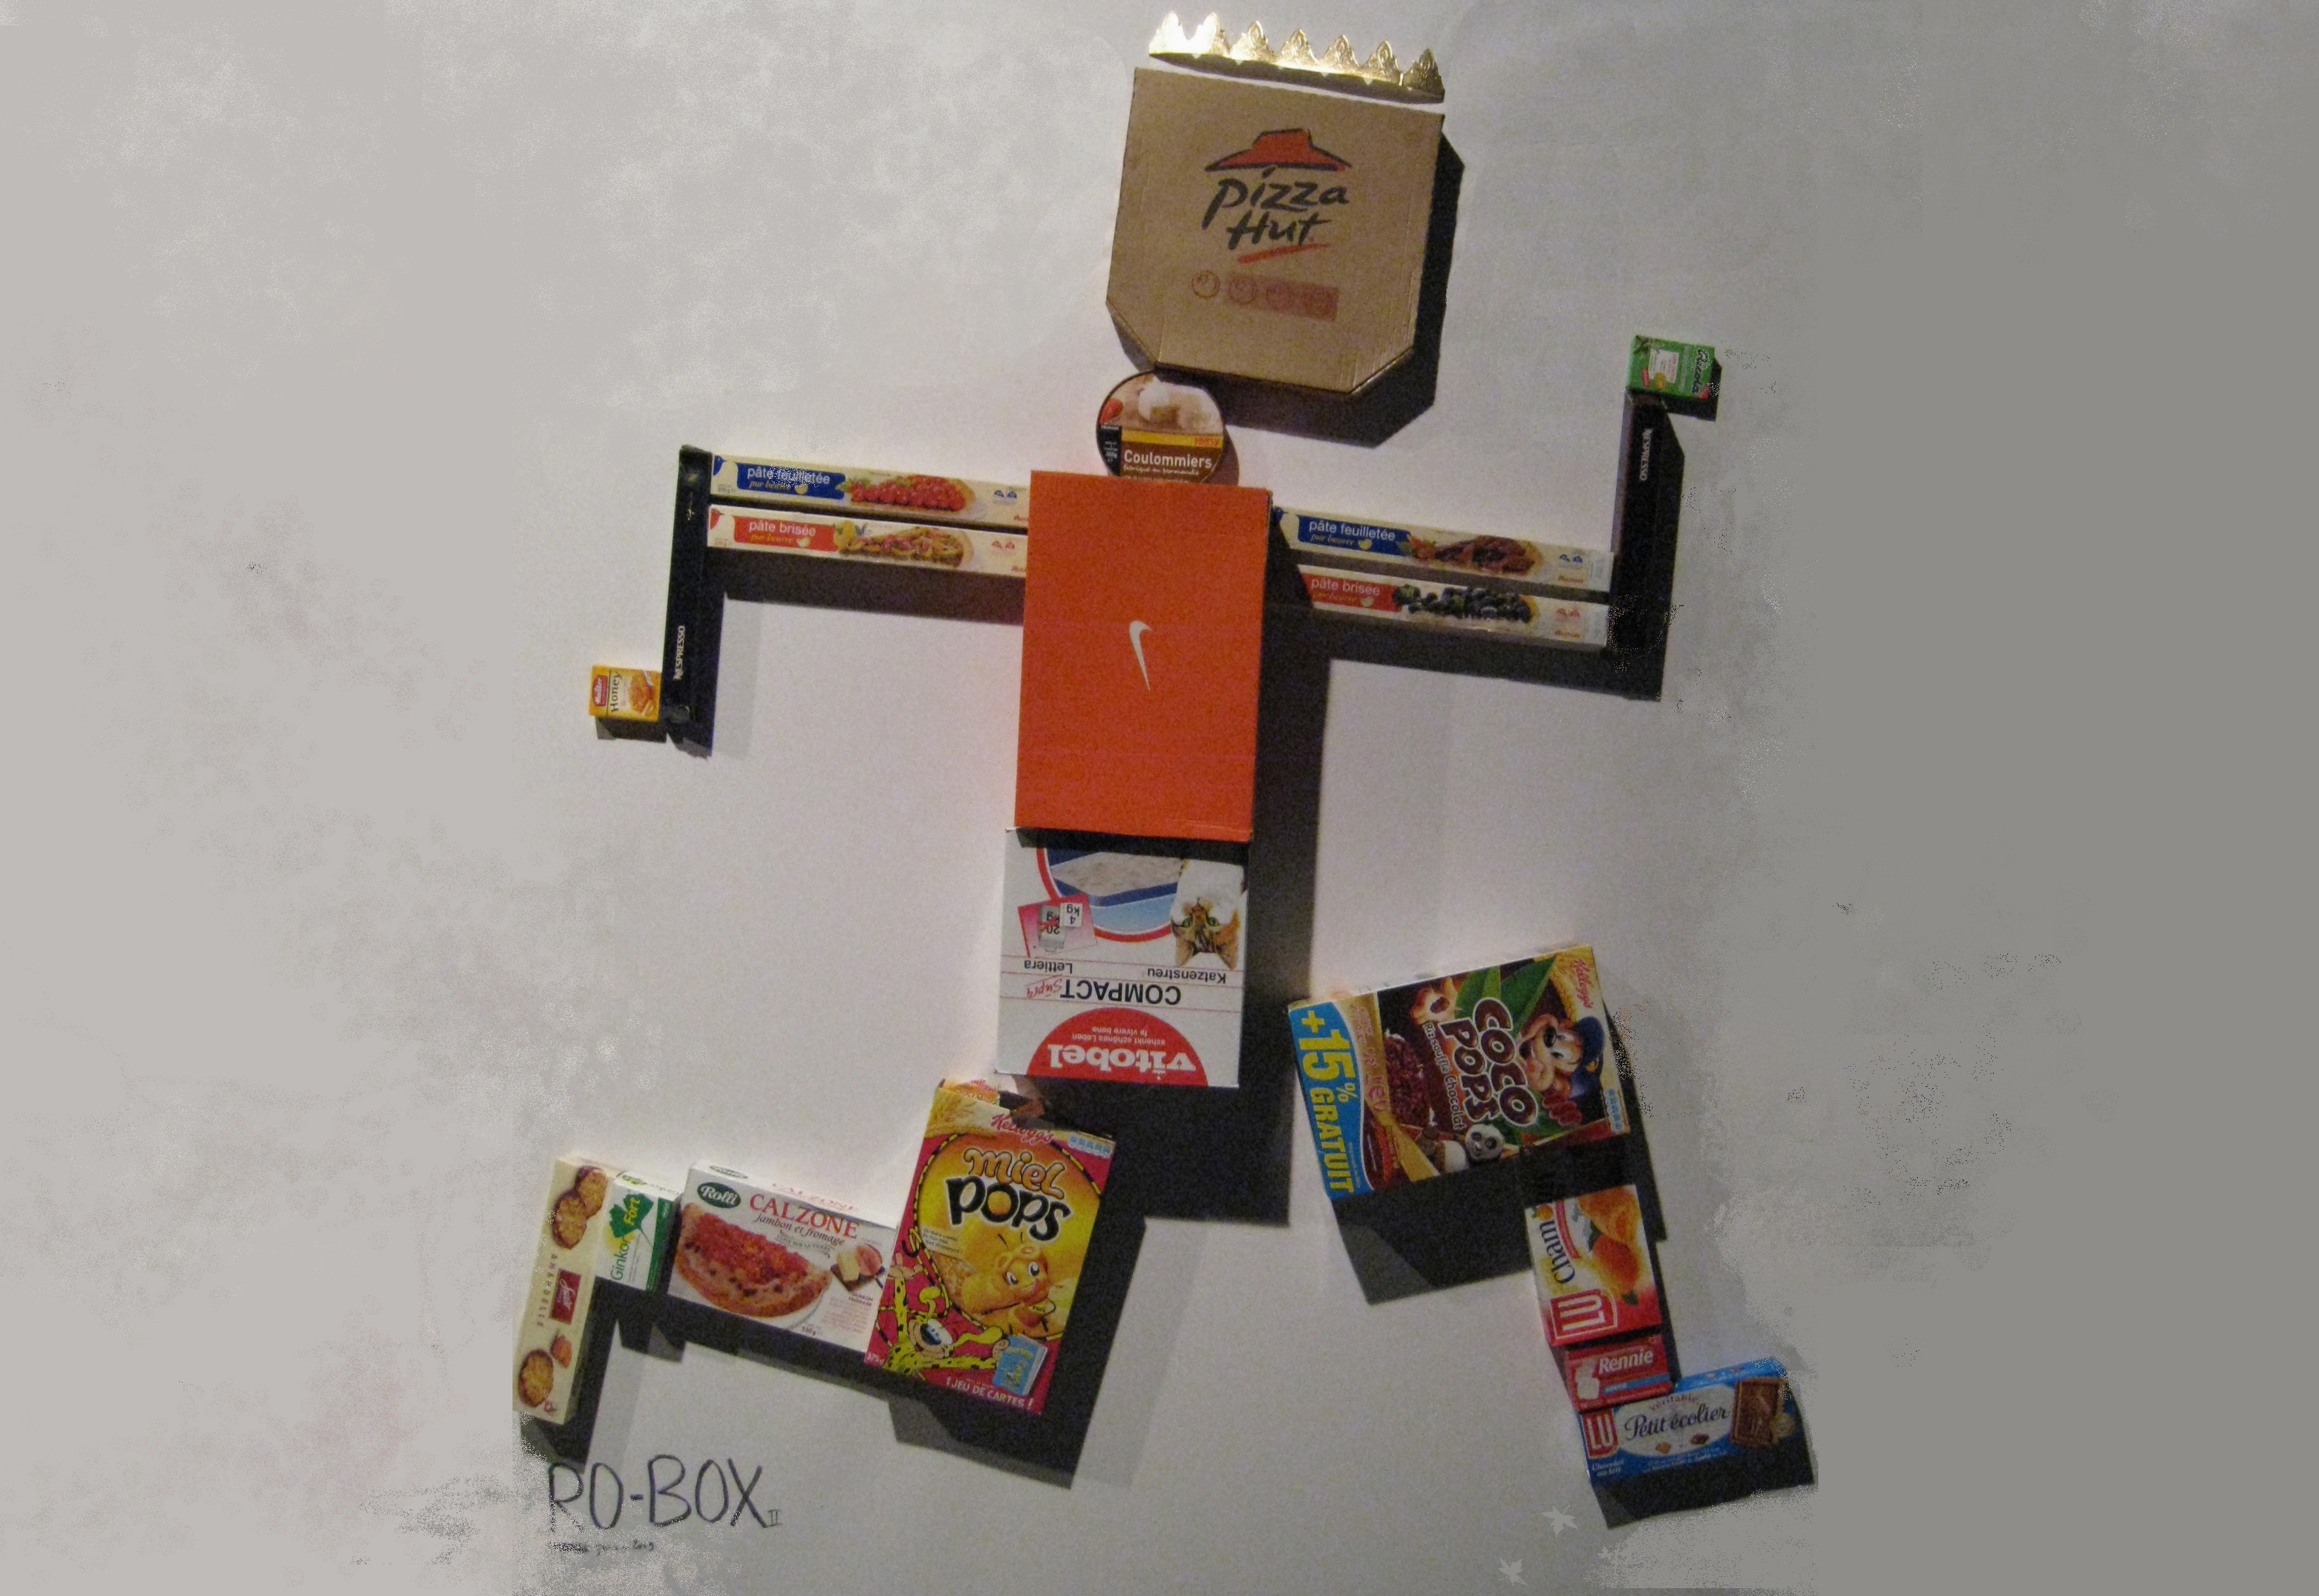 Ro-box II